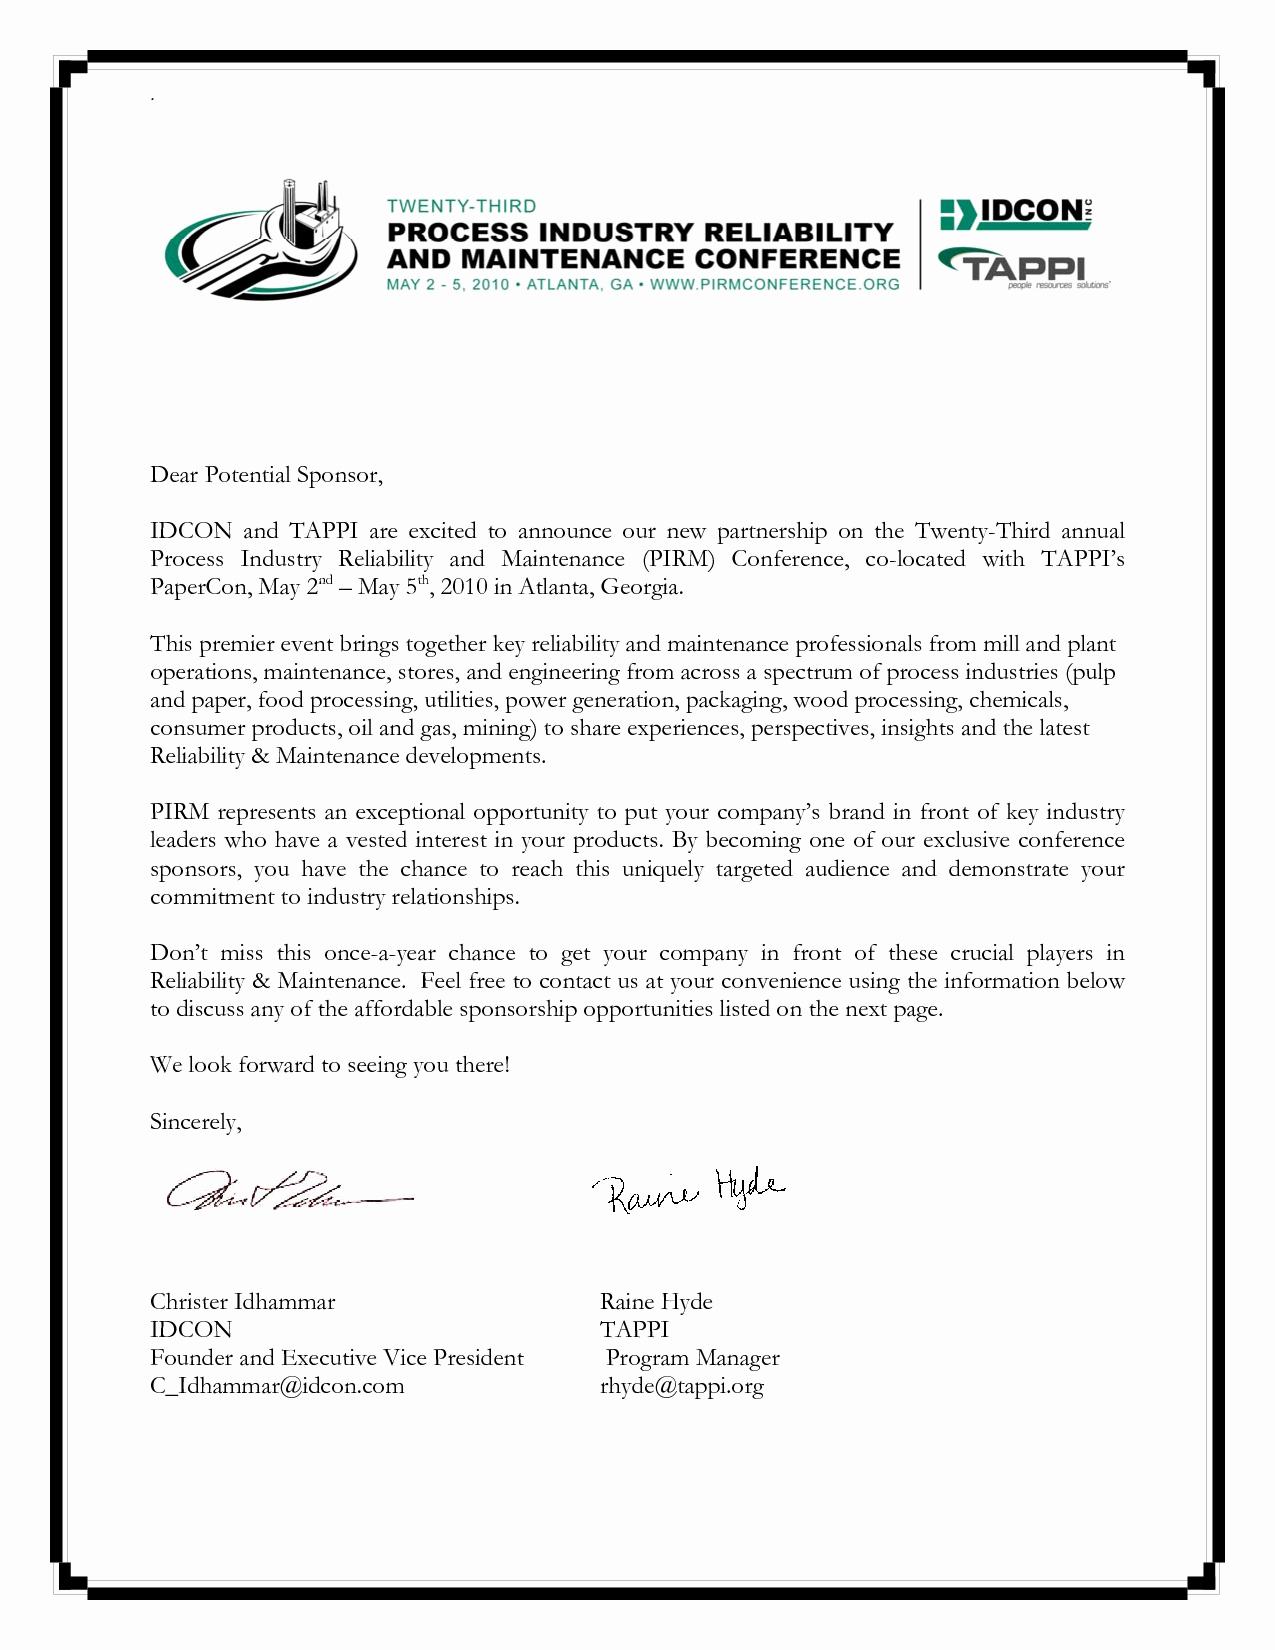 Sample Sponsorship Request Letter New Best S Of Sample Sponsorship Letter Templates